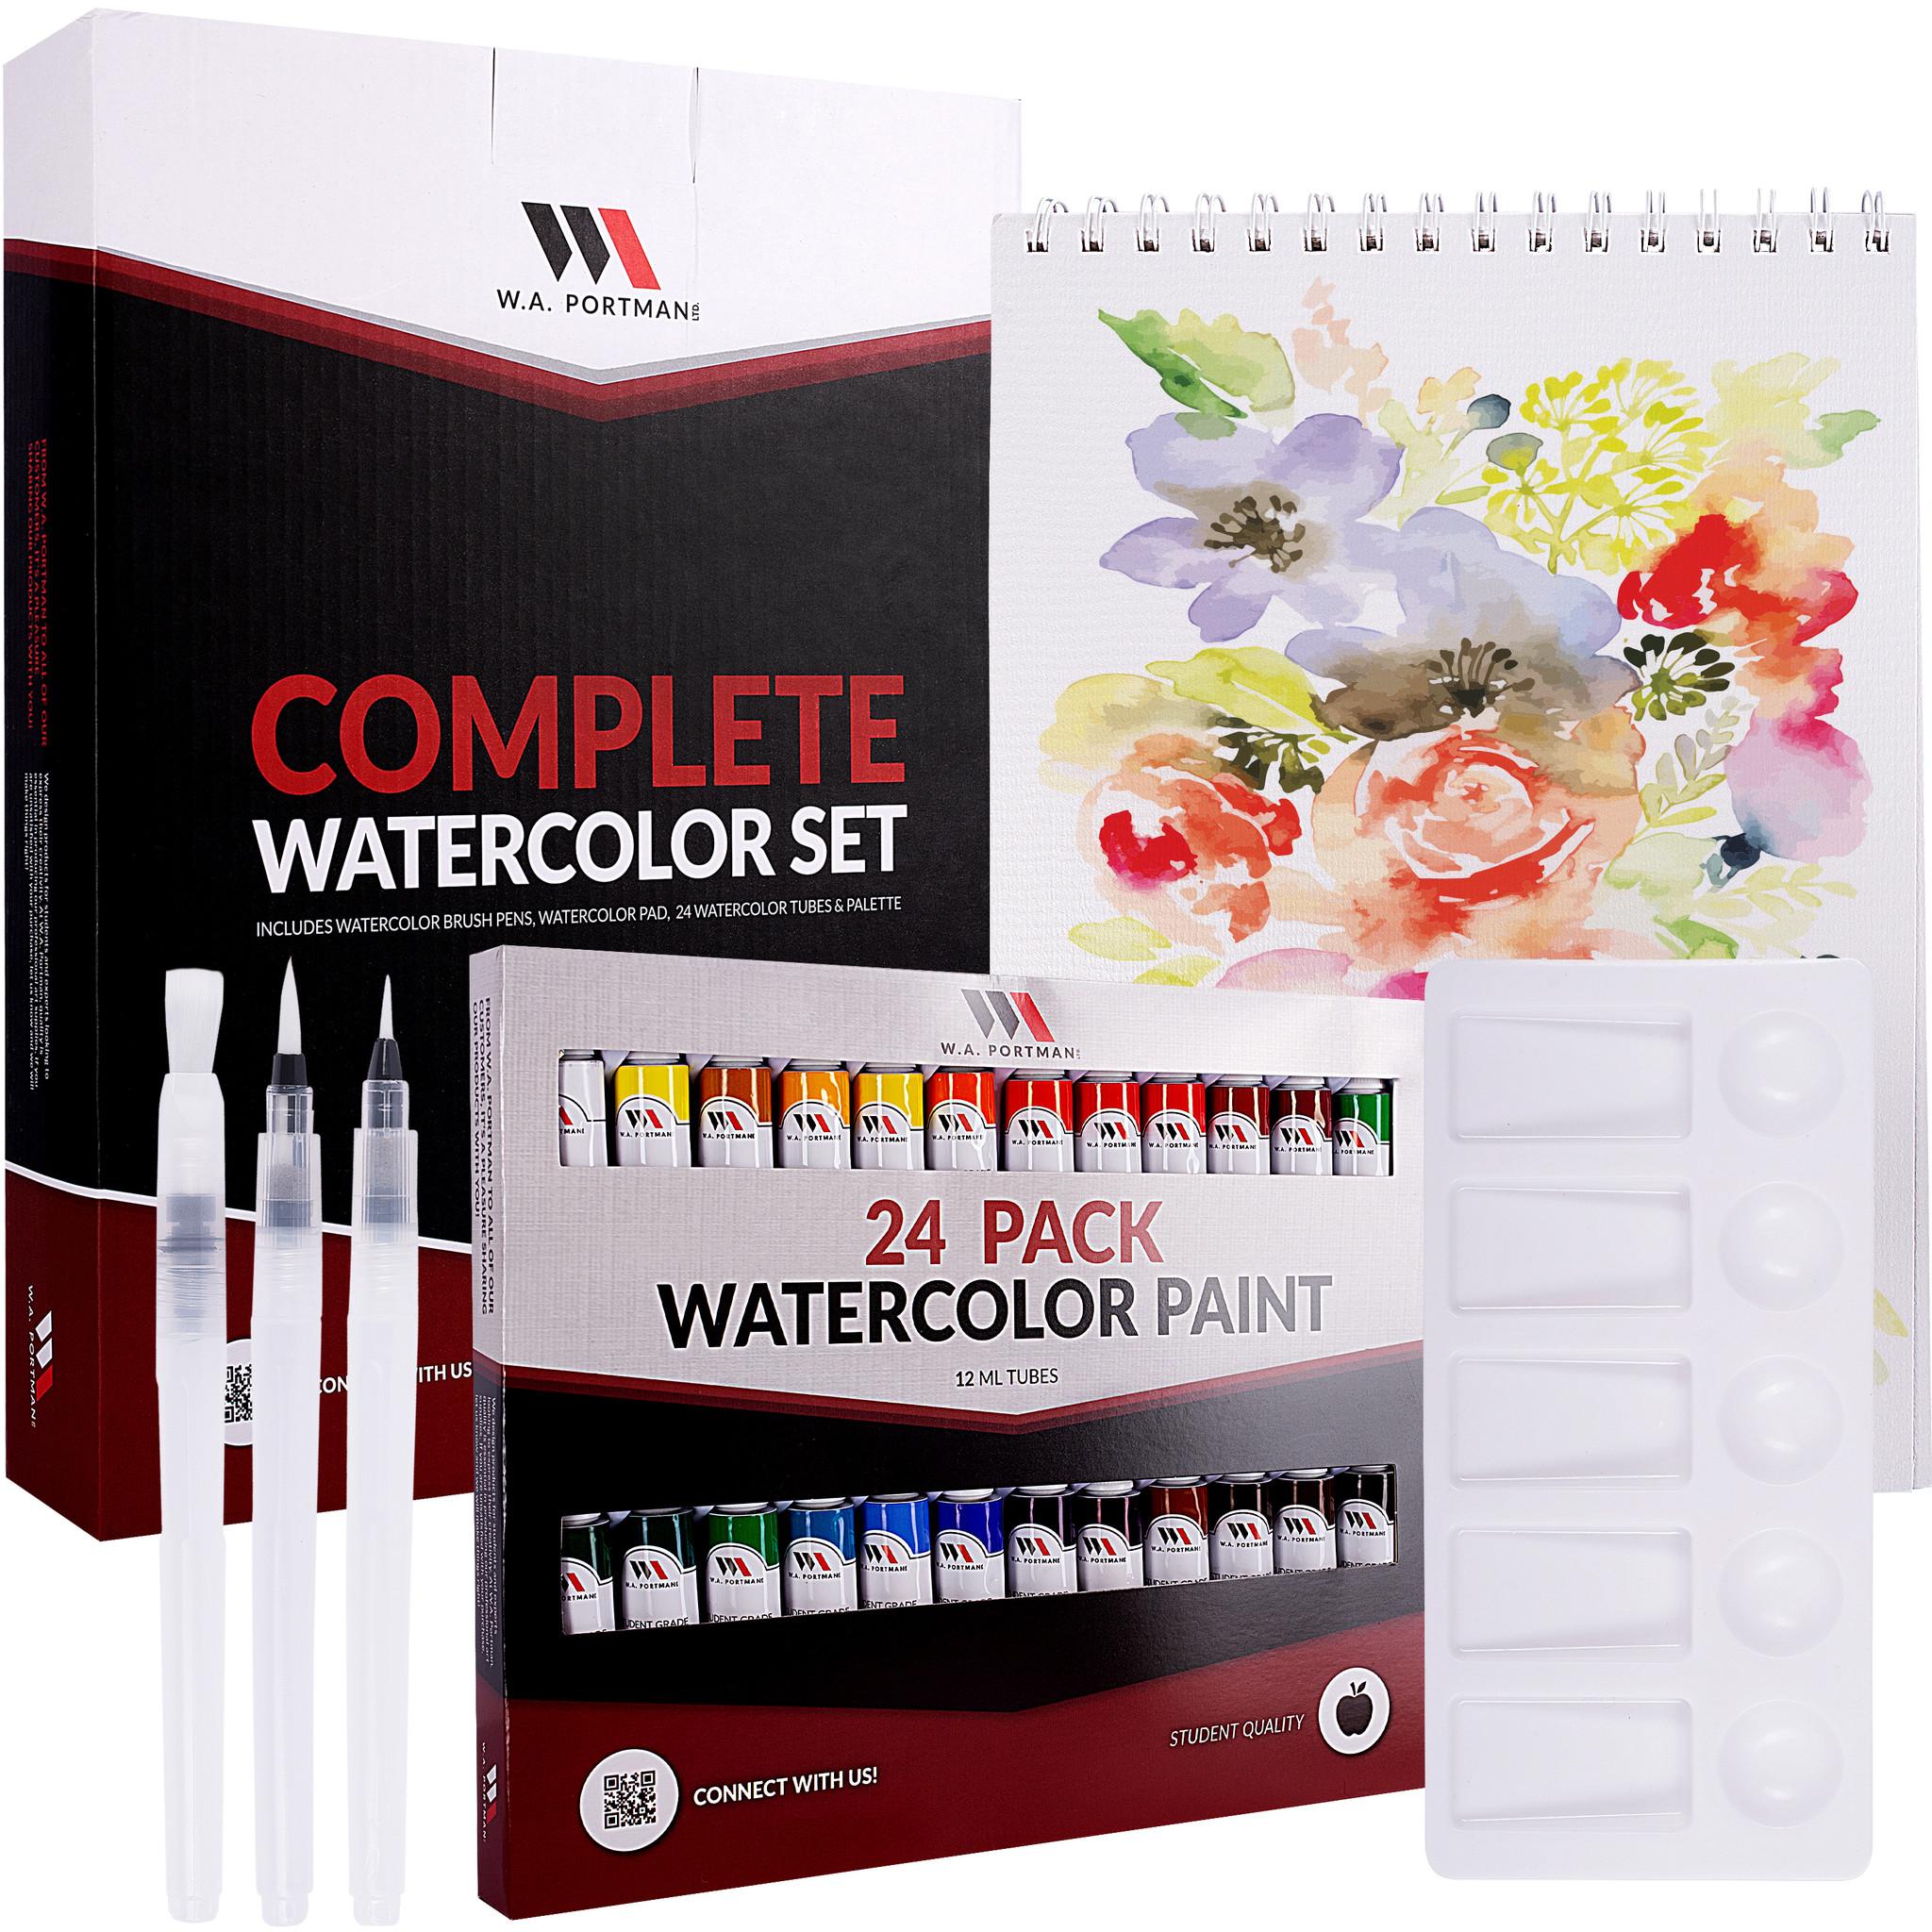 W.A. Portman Complete Watercolor Kit 29pc